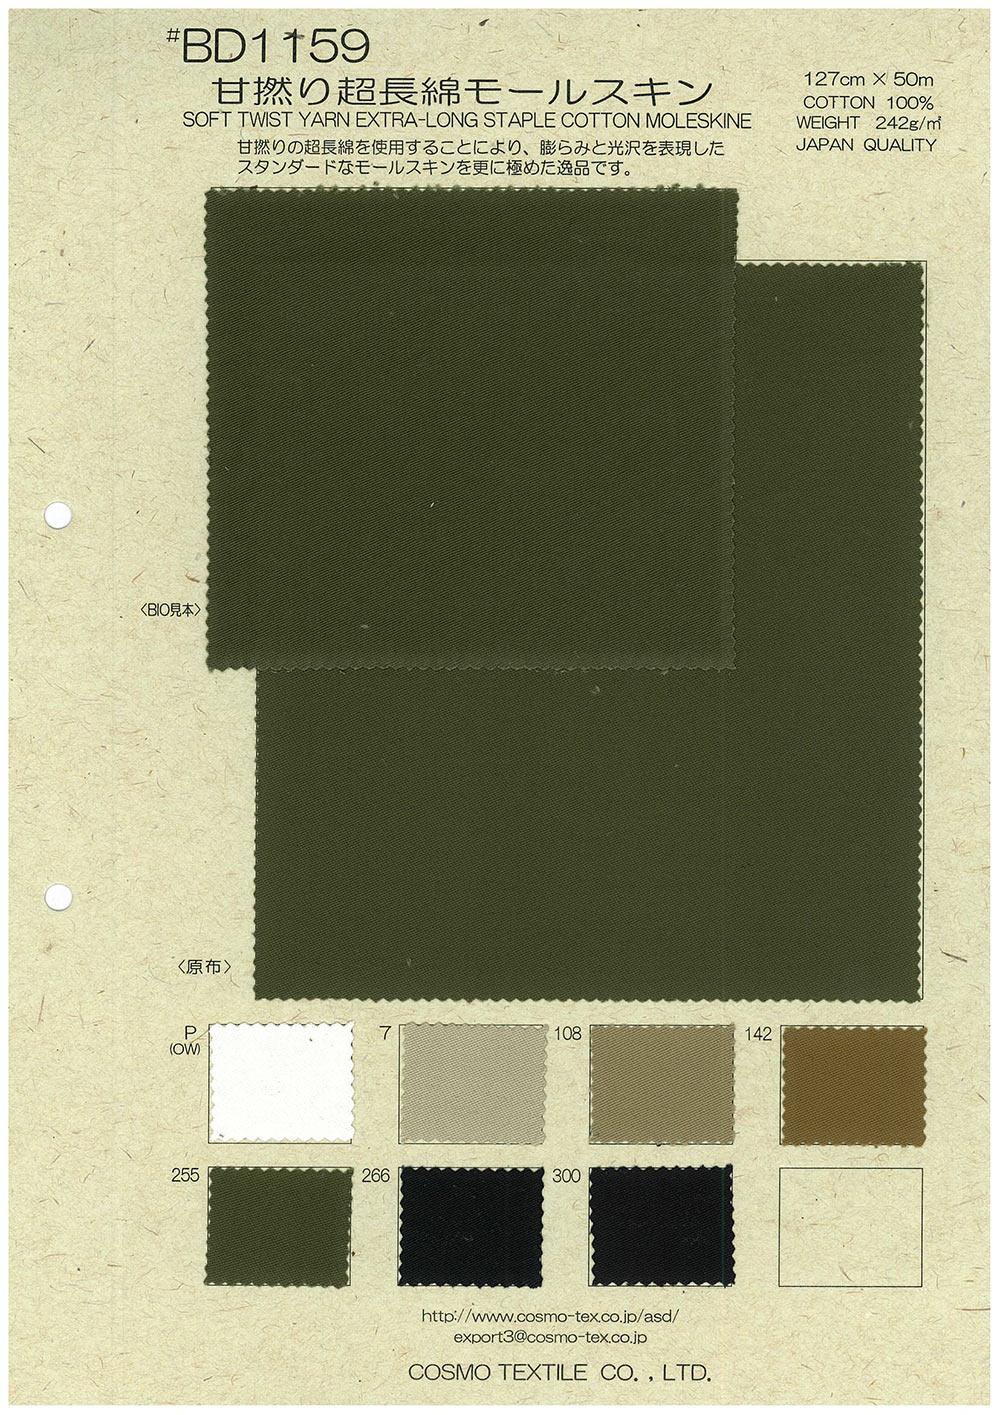 BD1159 甘撚り超長綿モールスキン[生地] コスモテキスタイル/オークラ商事 - ApparelX アパレル資材卸通販